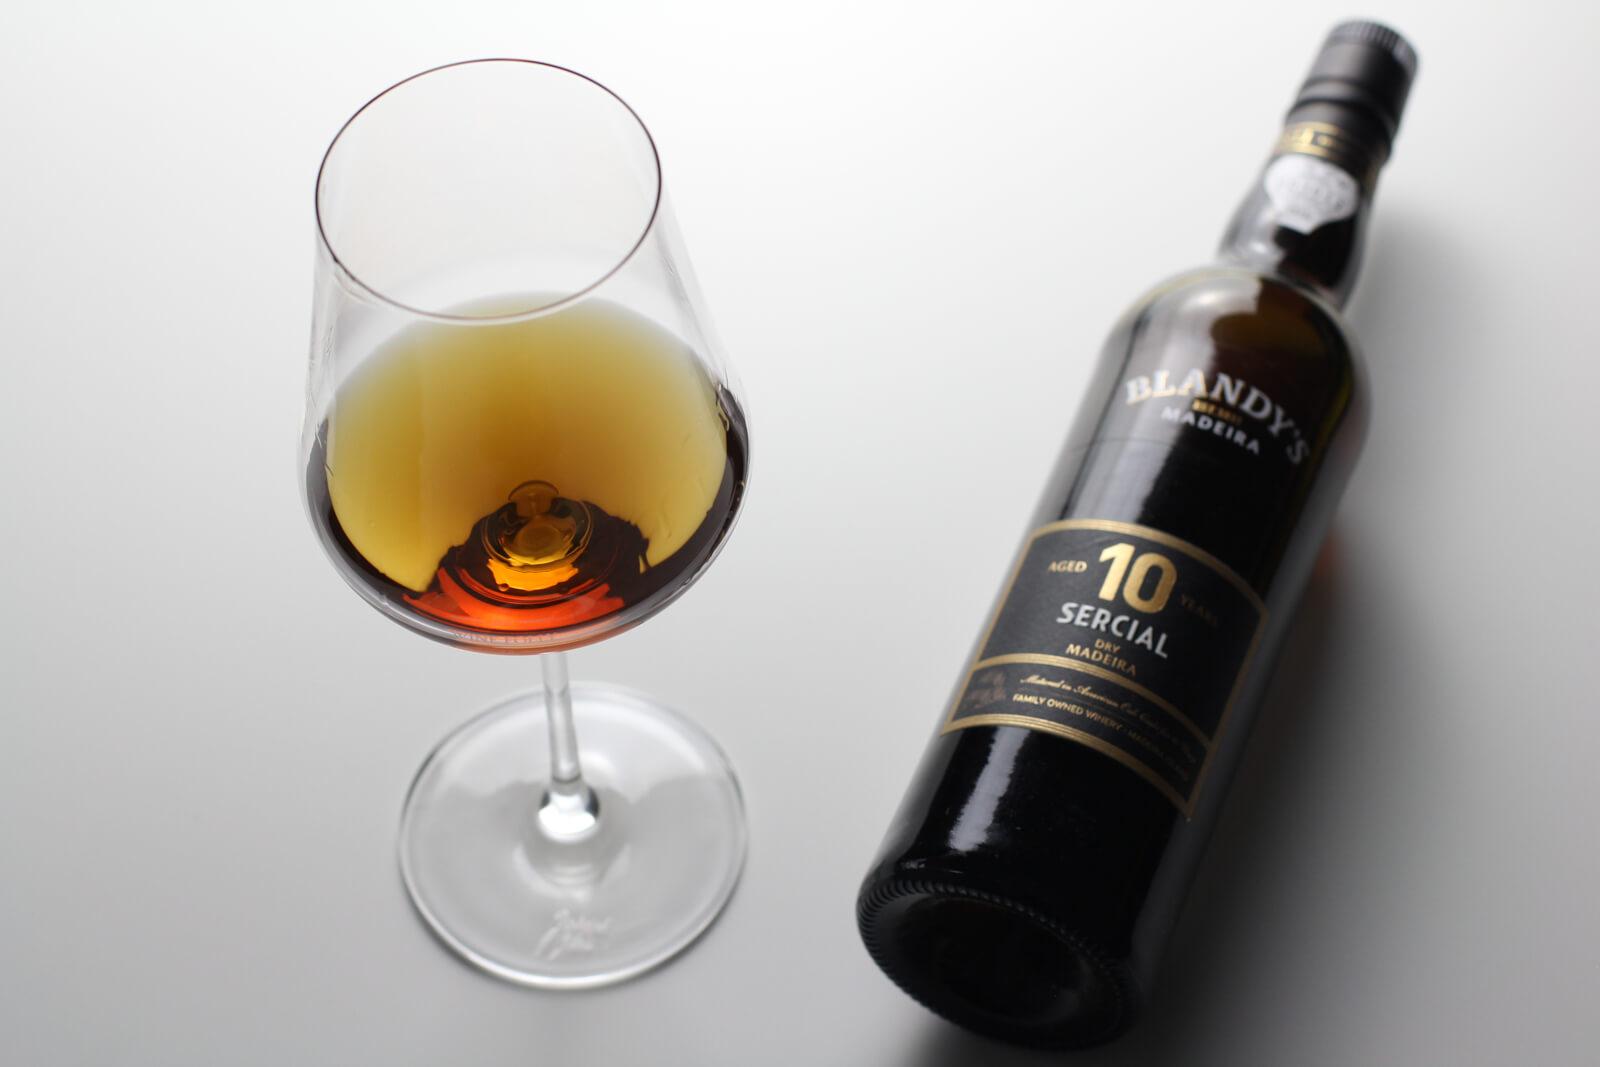 Sercial-Madeira-10-yrs-glass-WineFolly-Blandys